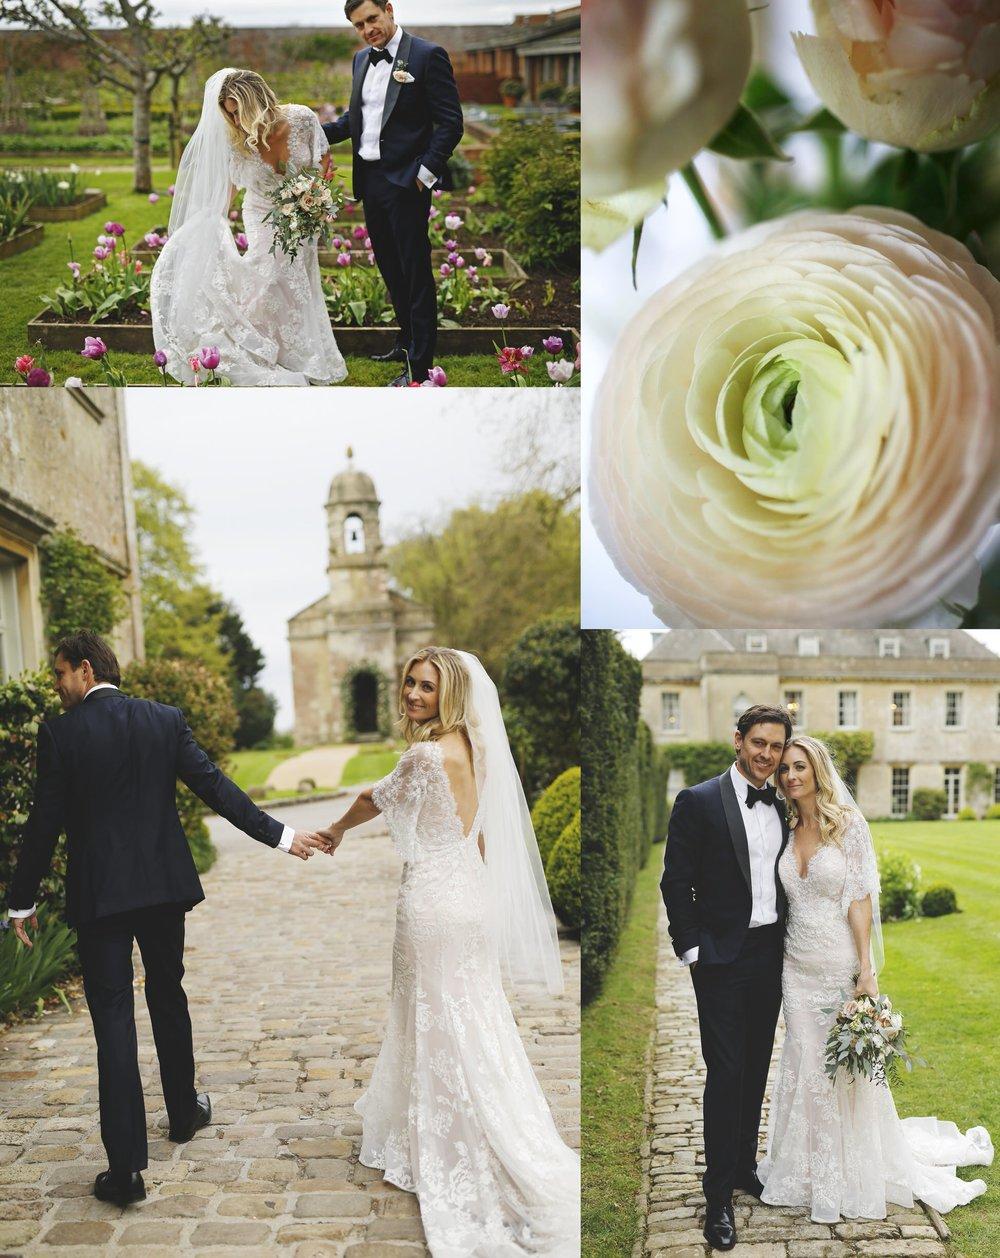 brett-harkness-babington-house-summer-wedding_0027.jpg